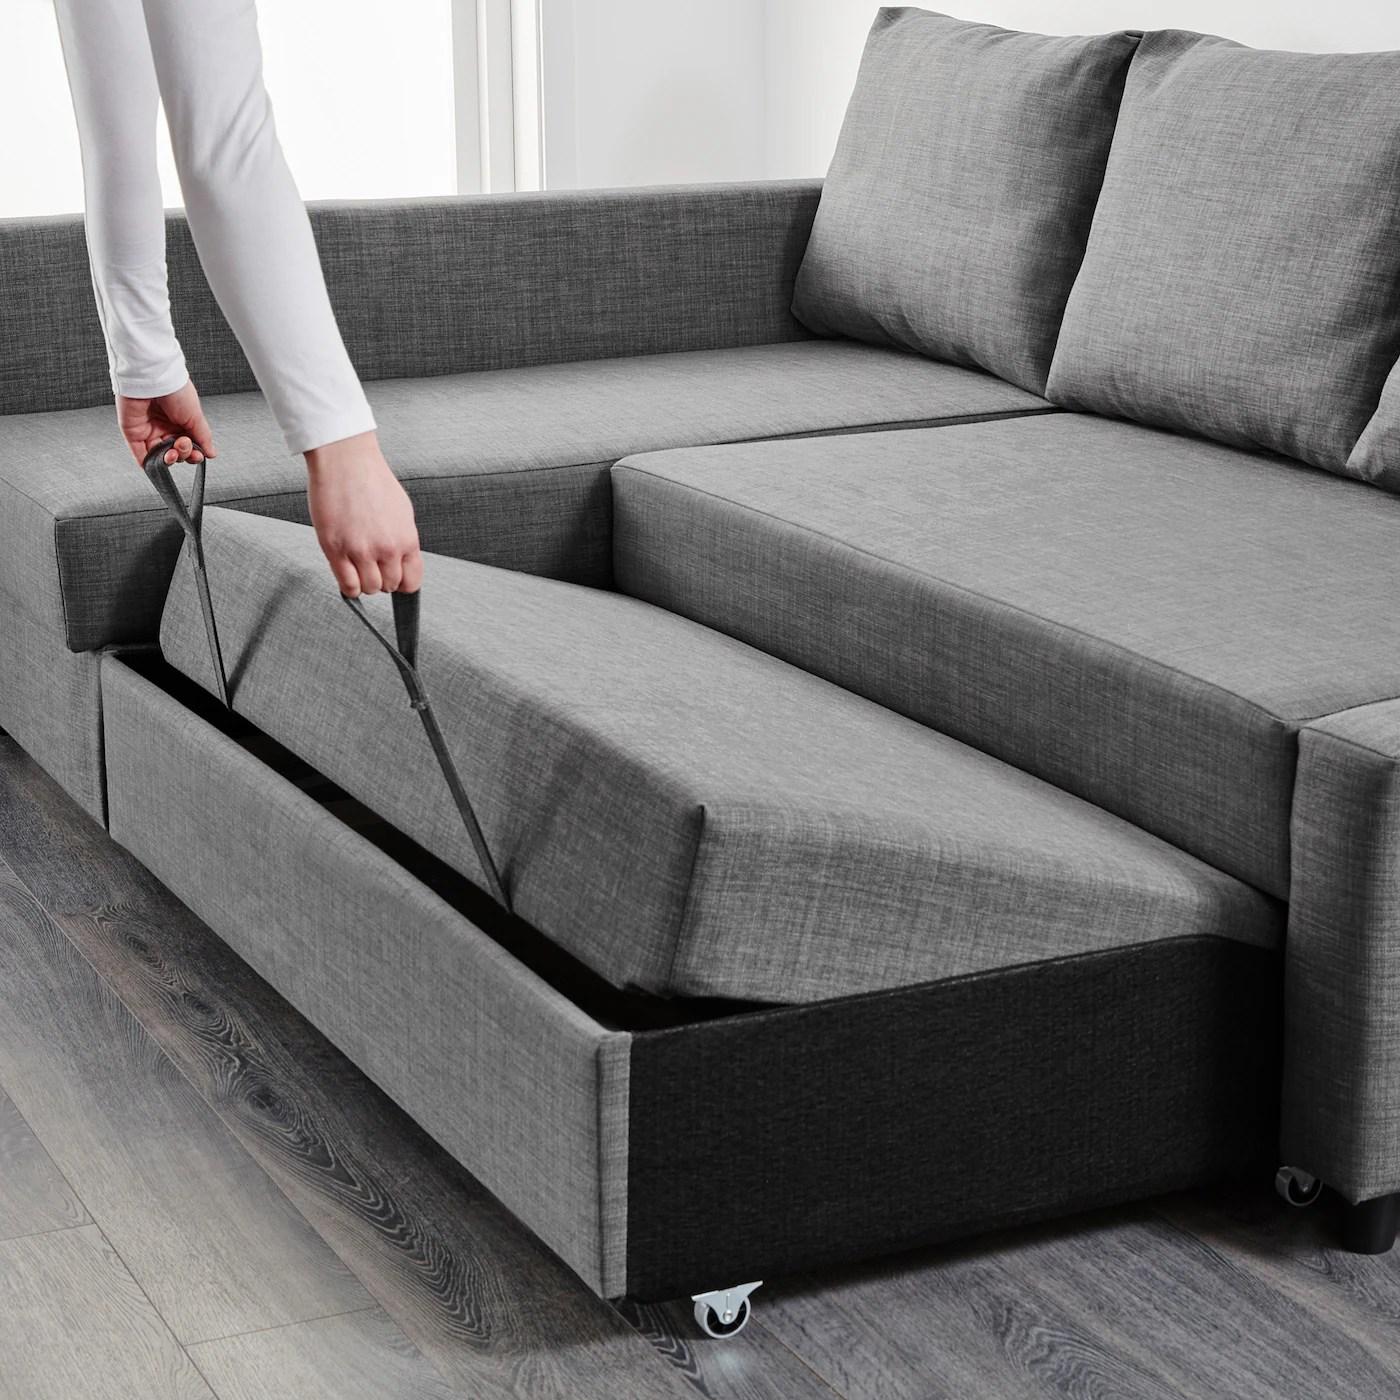 Canape Design Canapes Cuir Tissu Clic Clac Et Plus Ikea